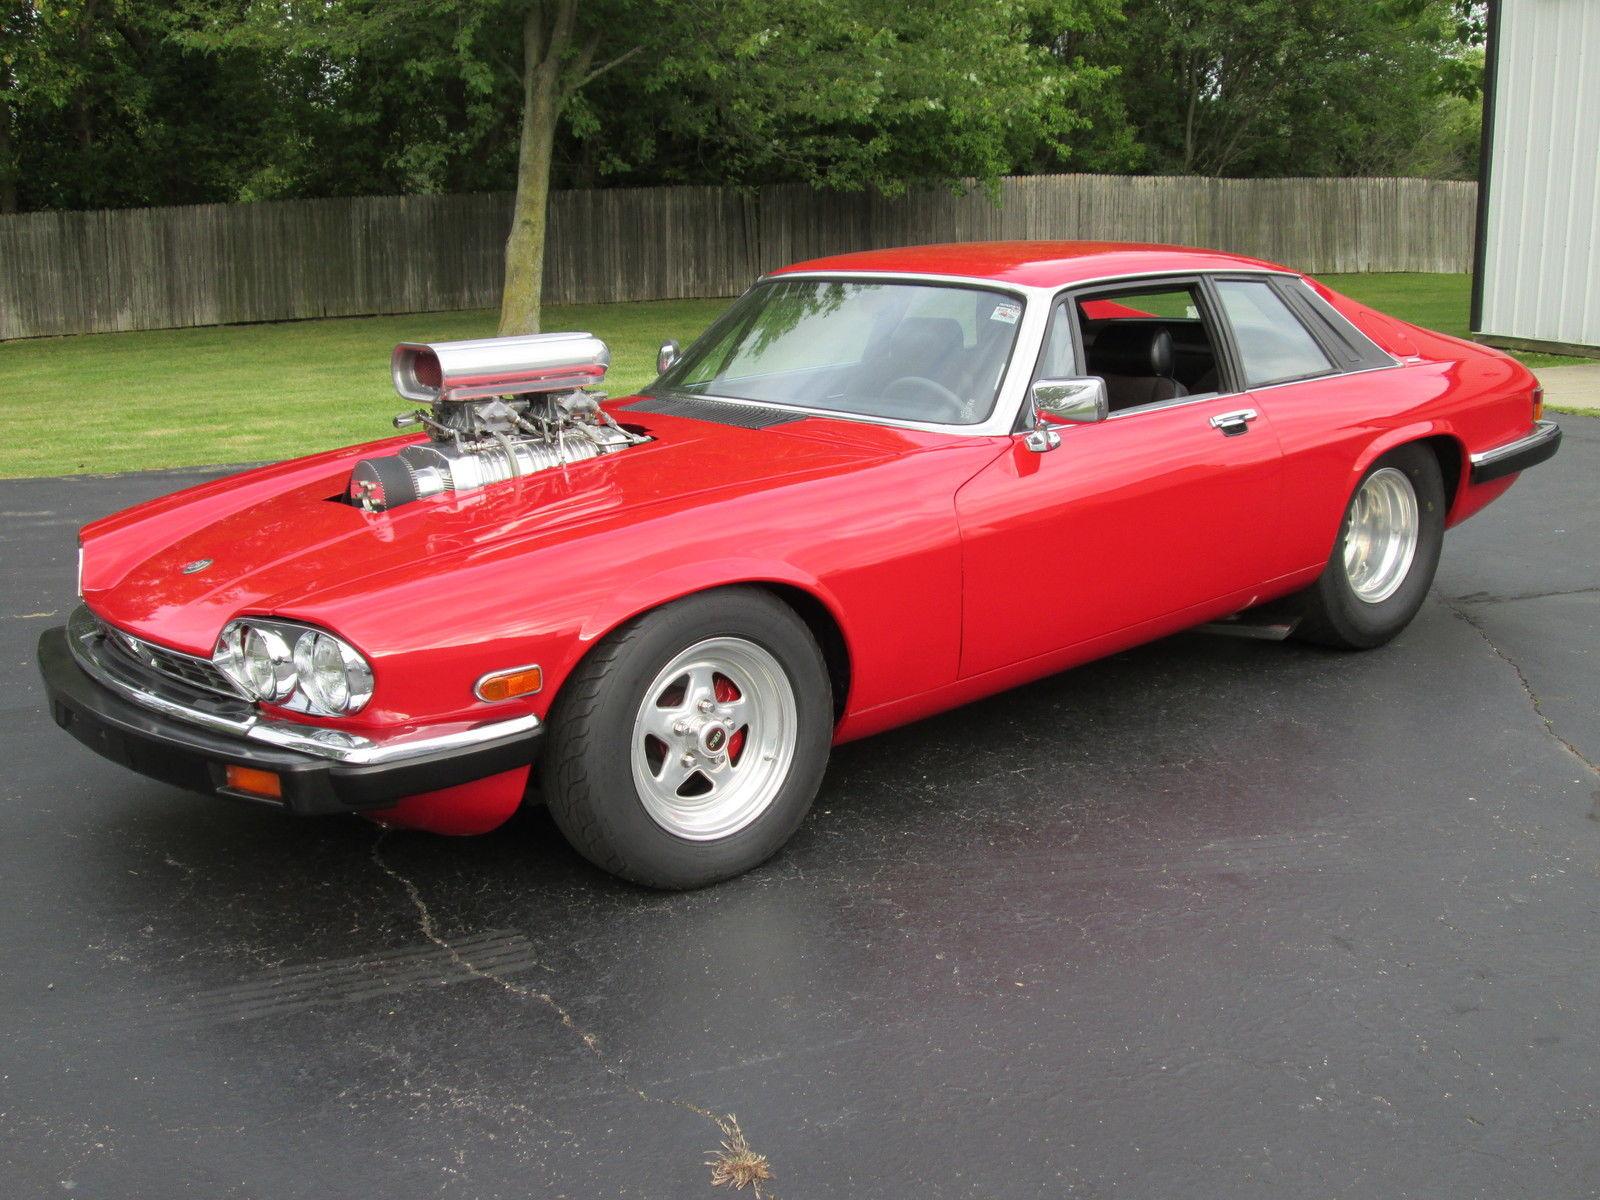 23 photos pro street blown 383 chevy stroker jaguar xjs 1983